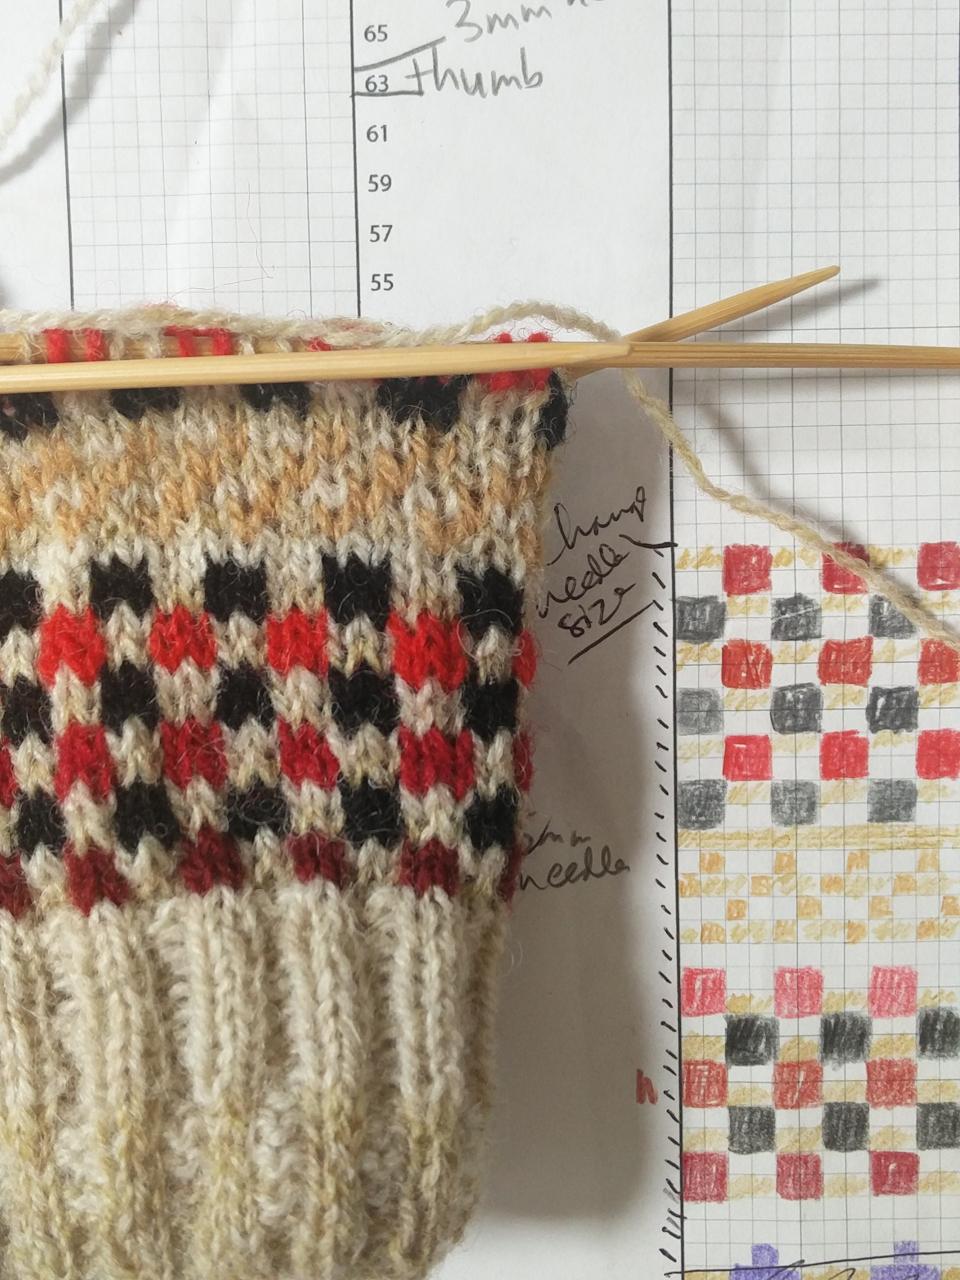 Felix knits Knitted Sheaths!